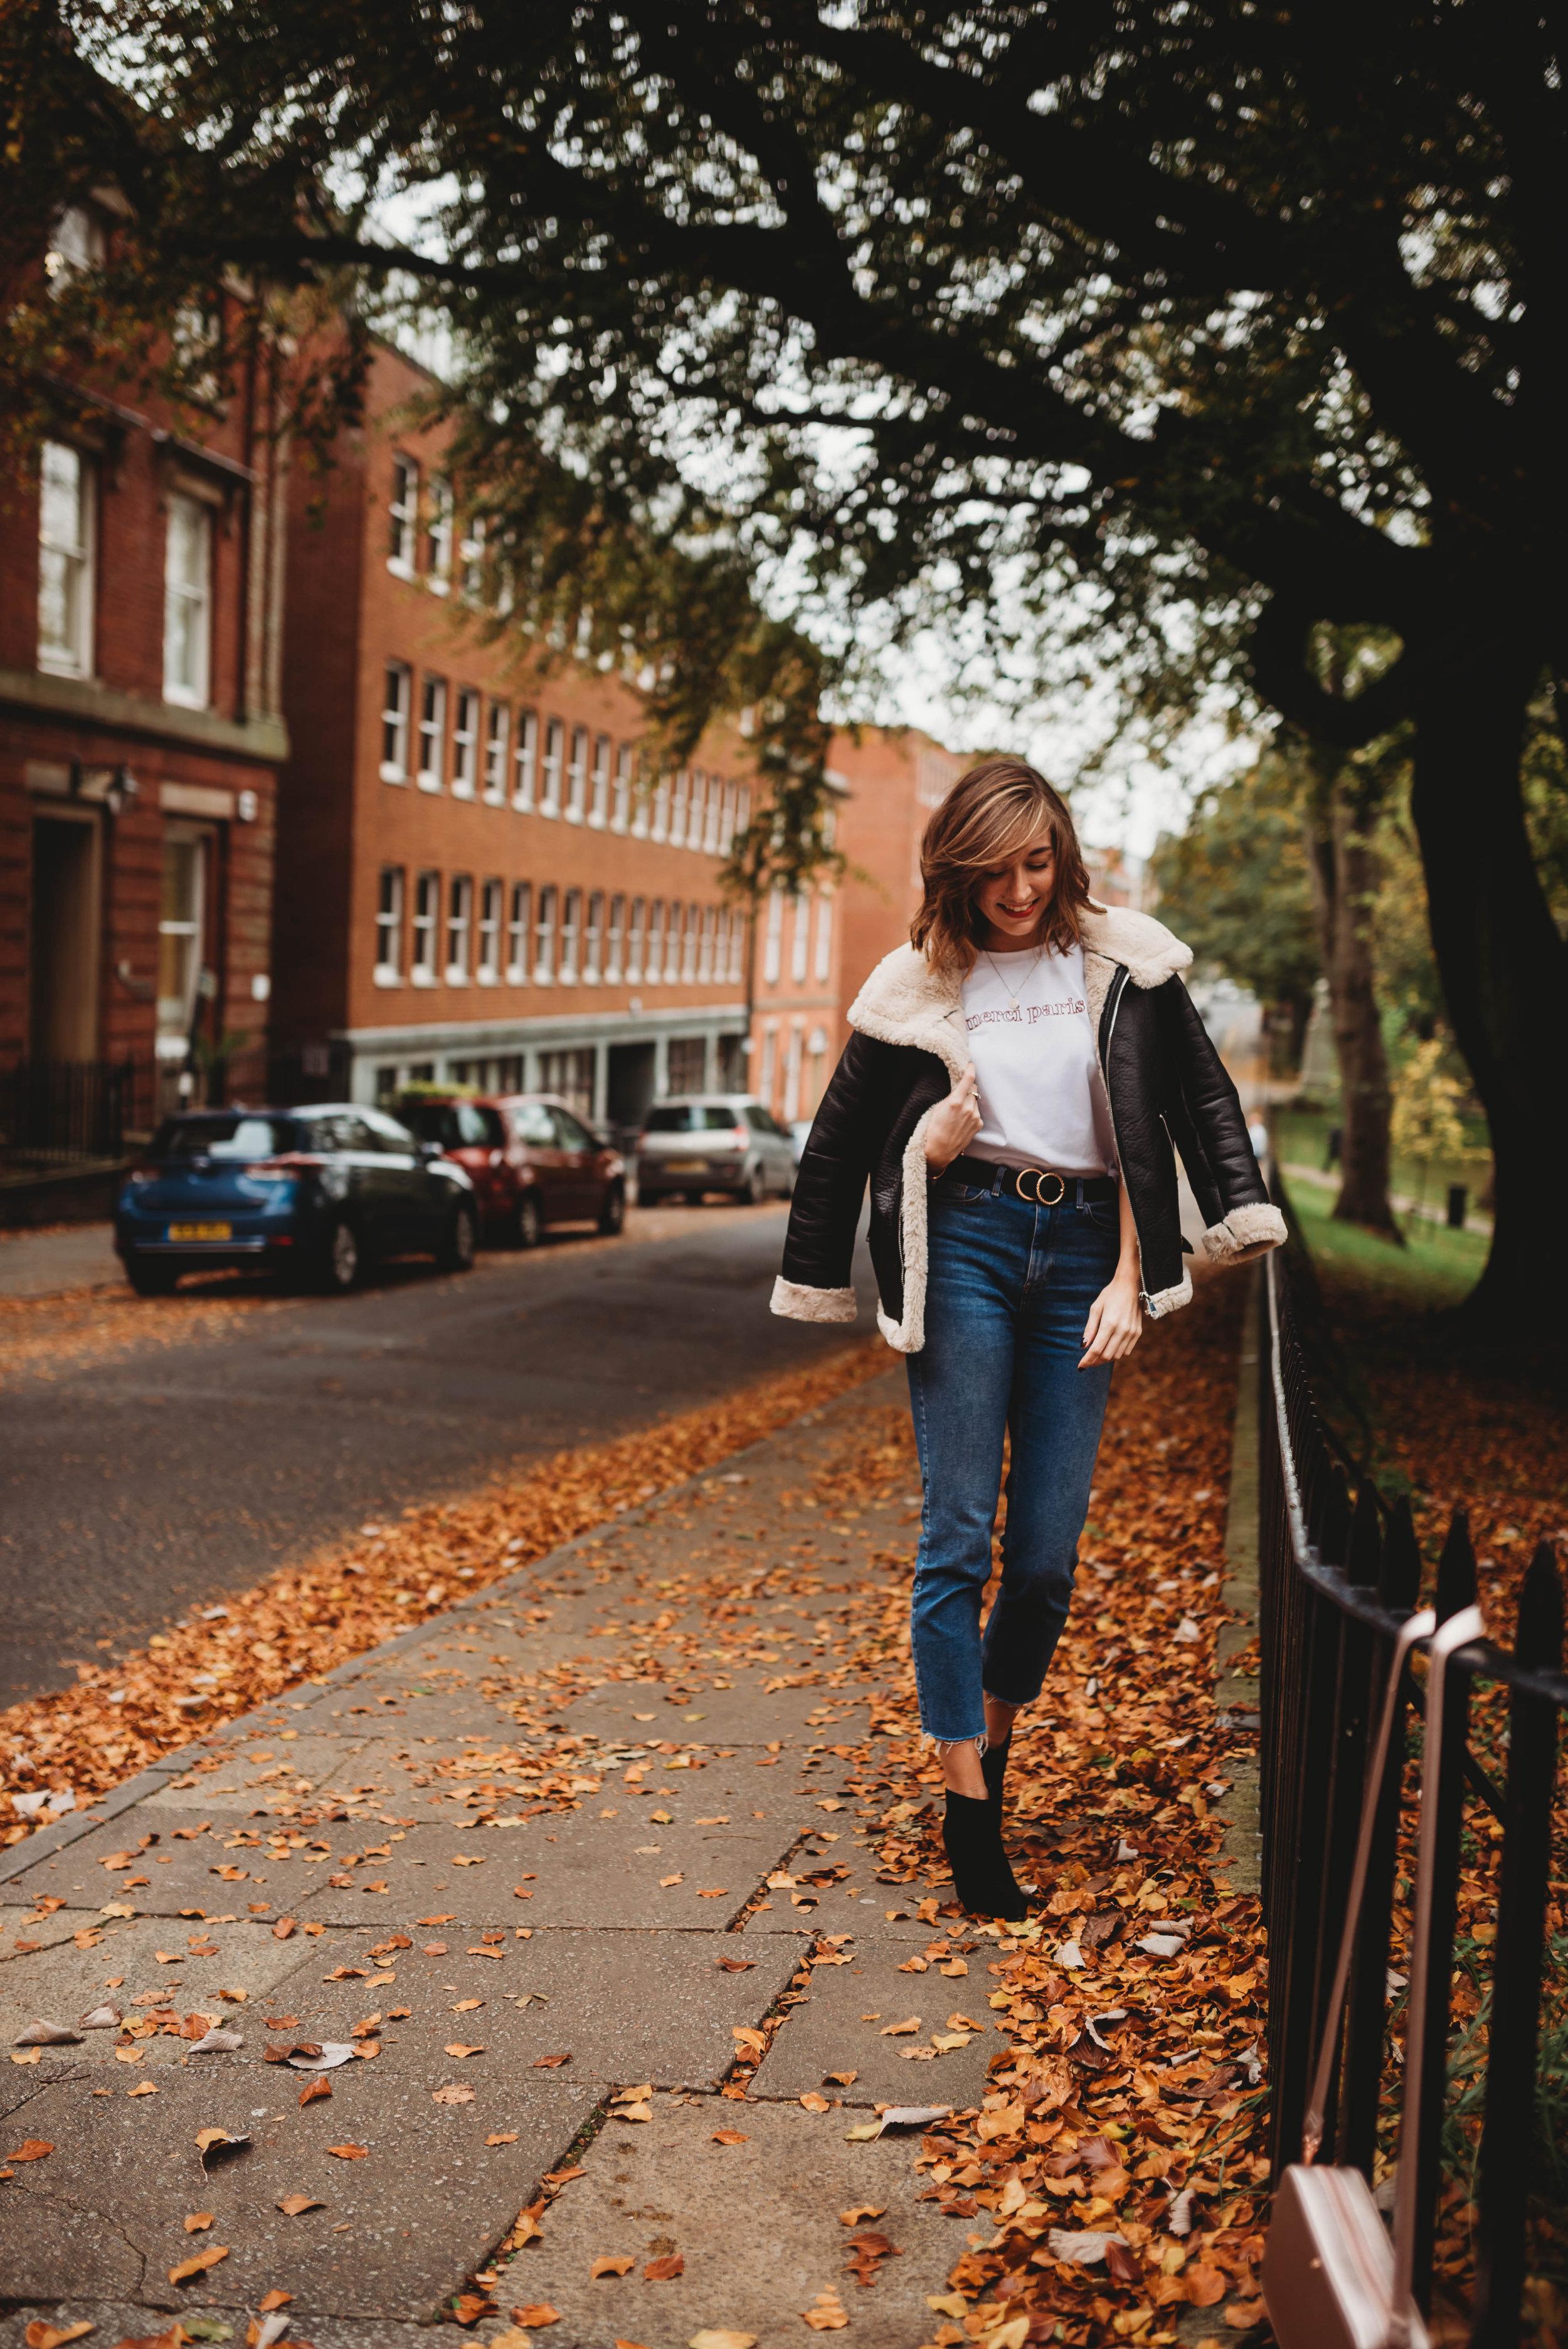 Outfit Details: Jacket & Jeans (Primark), Boots & Merci Paris T-Shirt (Marks & Spencer), Belt (River Island), Coin Necklace (Sarah Styles)